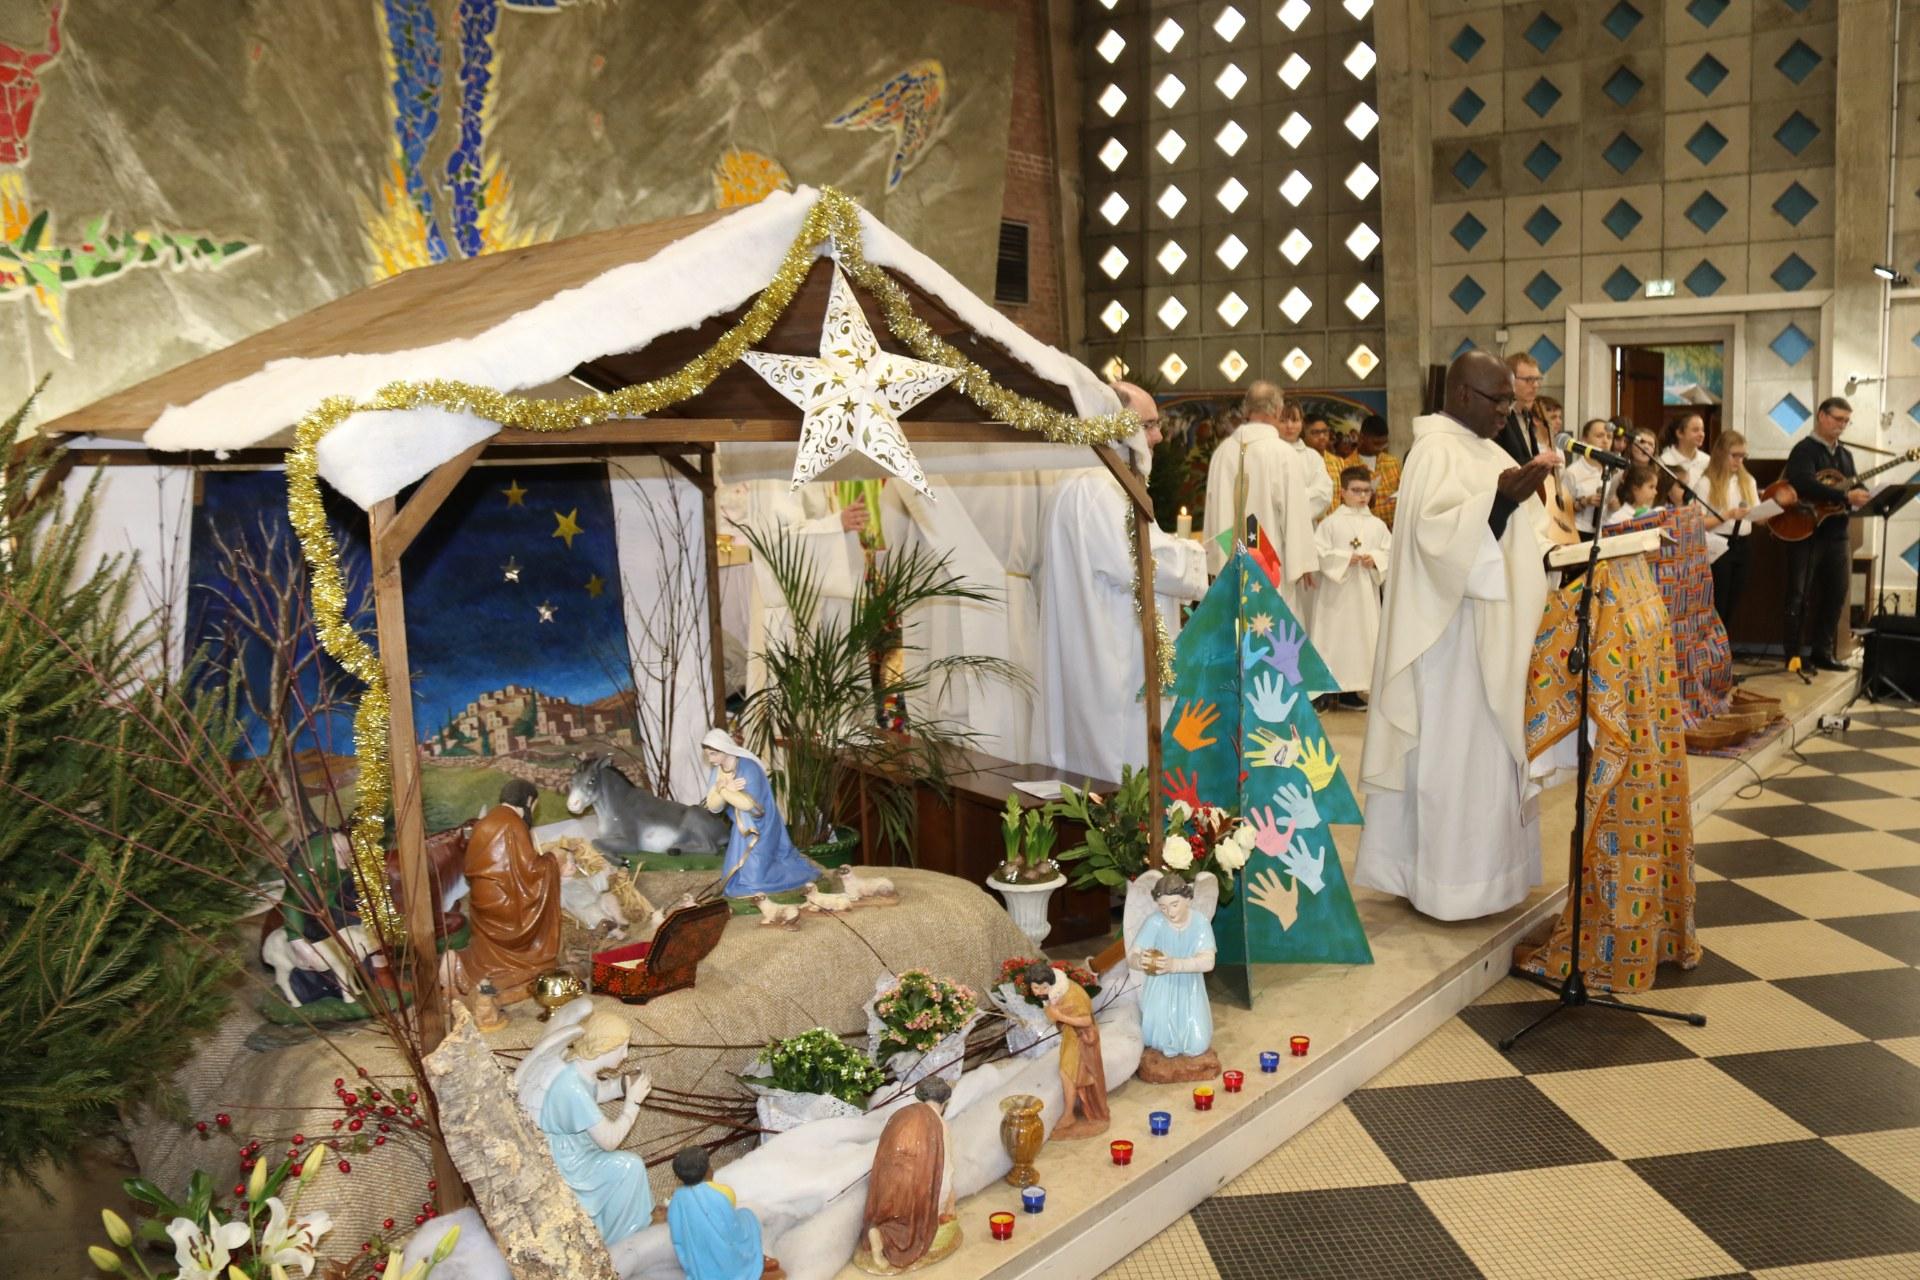 Messe des Nations 93